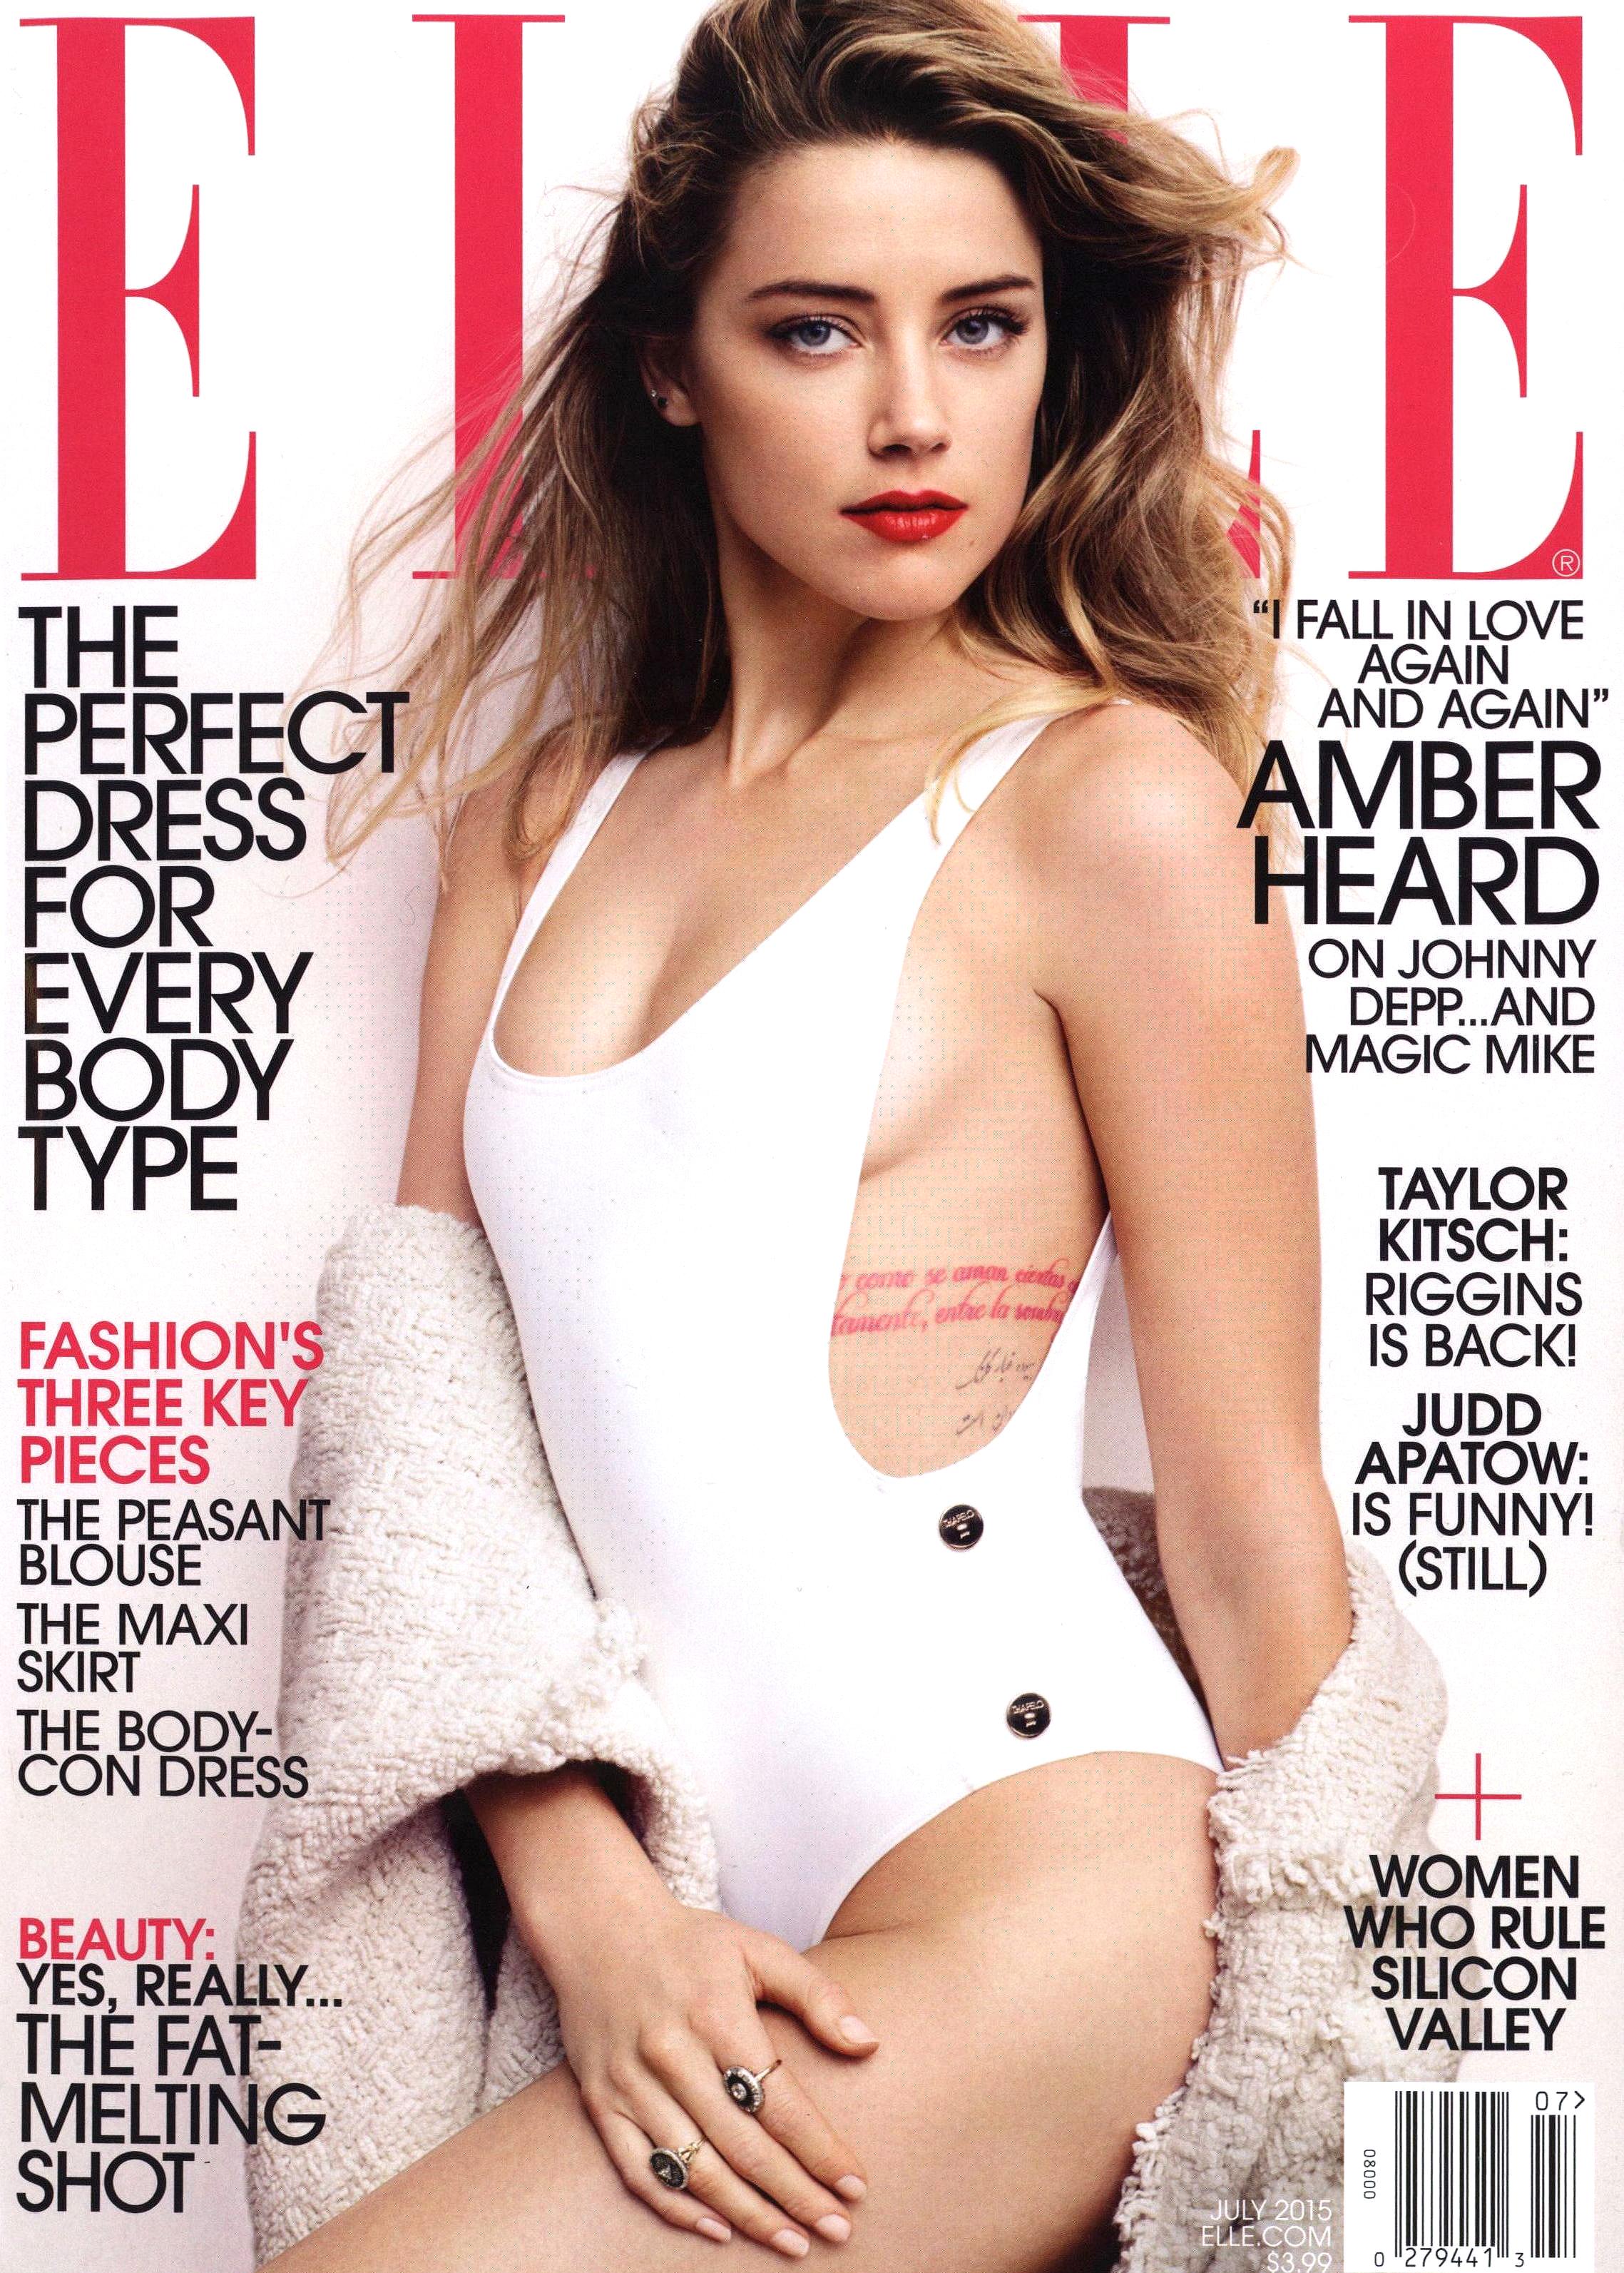 Lili Anolik Elle Magazine Taylor Kitsch July 2015